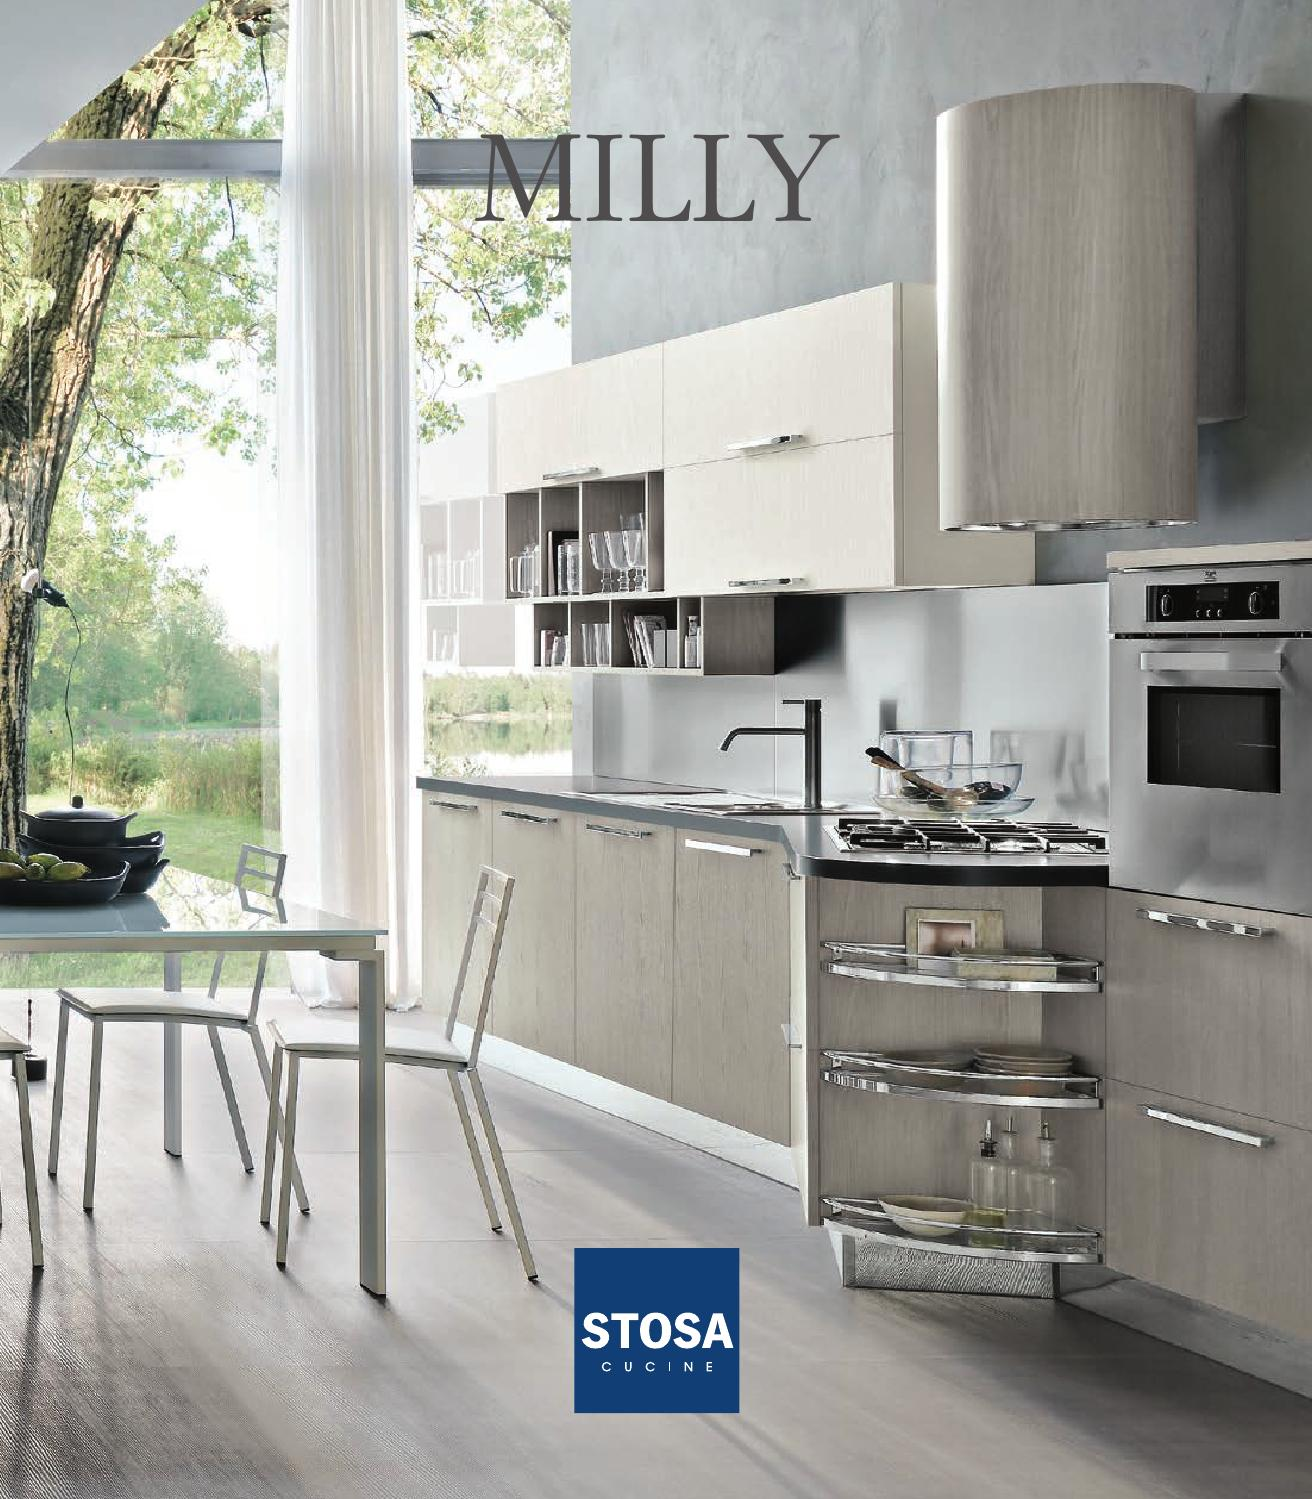 Stosa Cucine Moderne | Milly by Irina Medvedeva - issuu